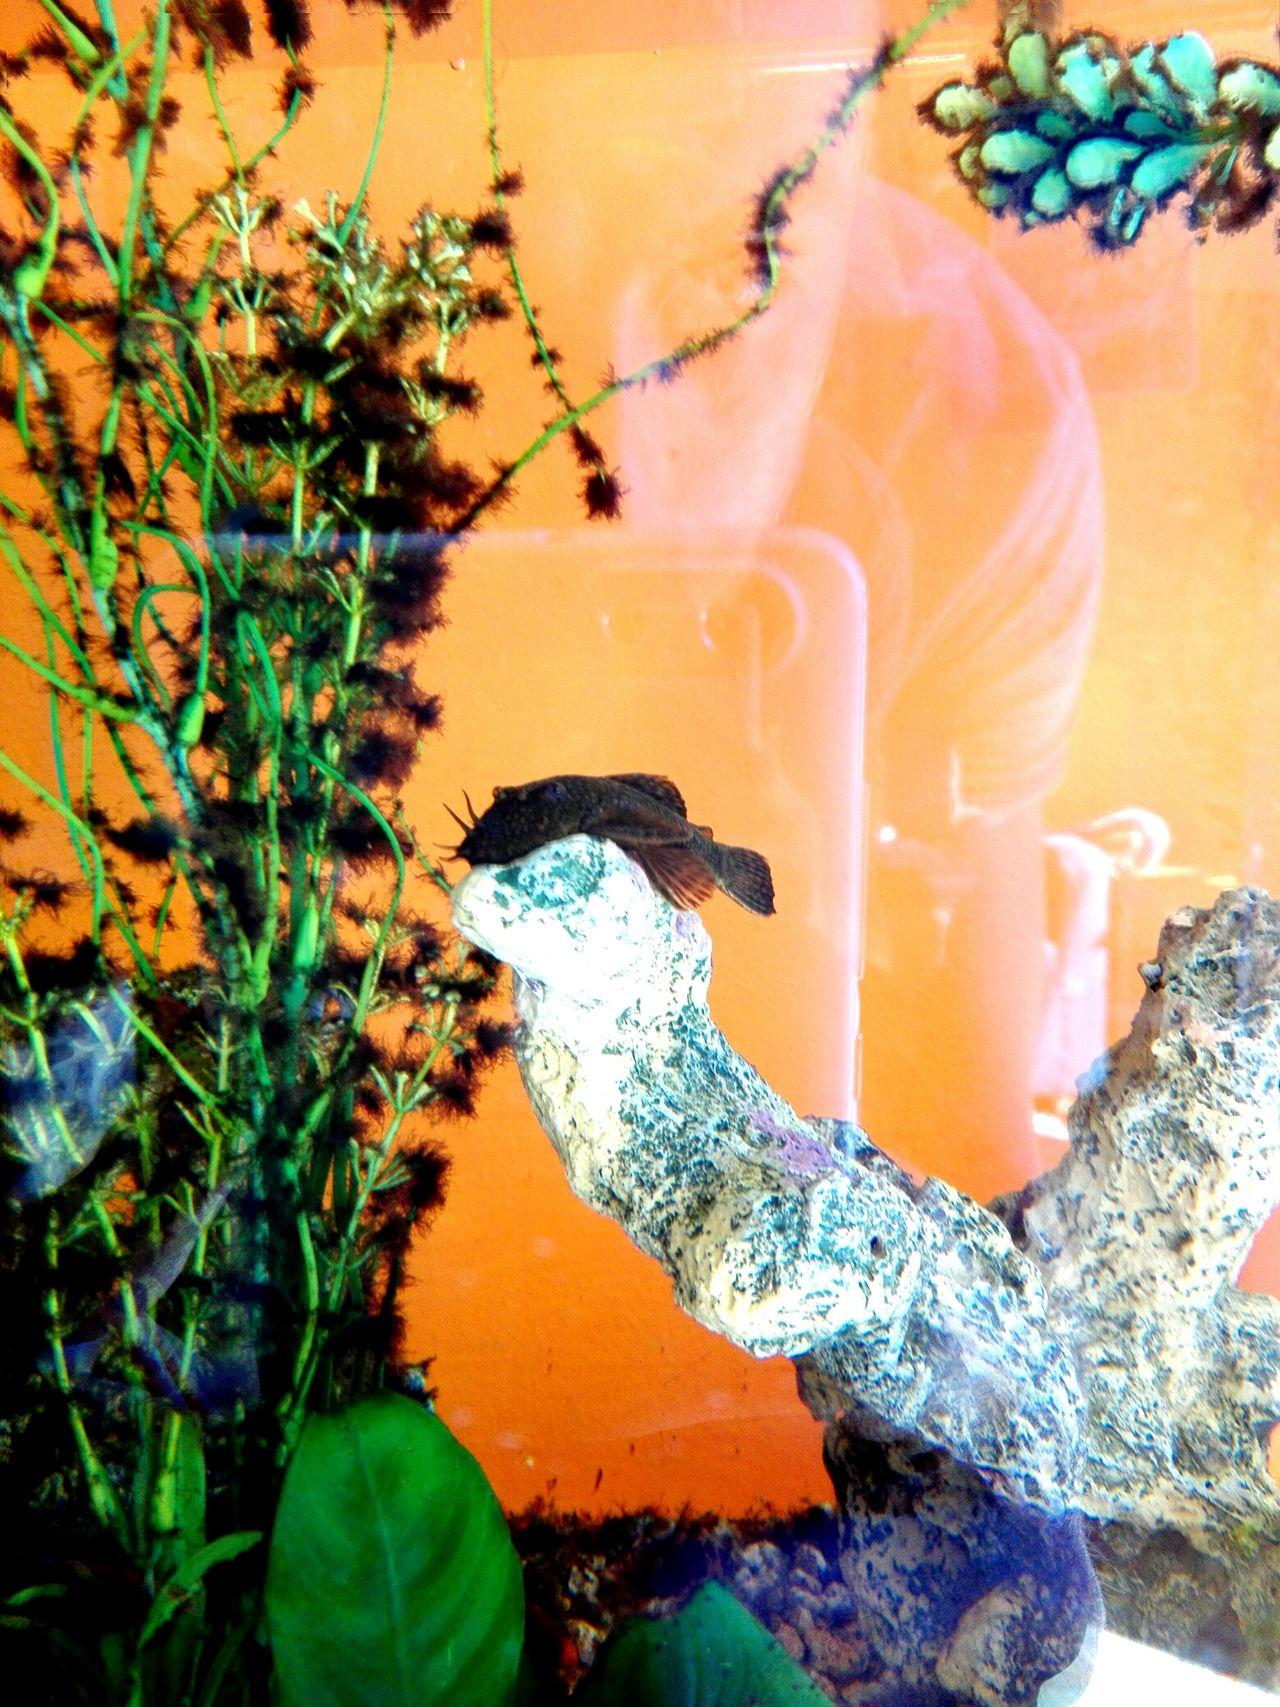 Nelmioacquario Pesce Pulitore Fish Relaxing